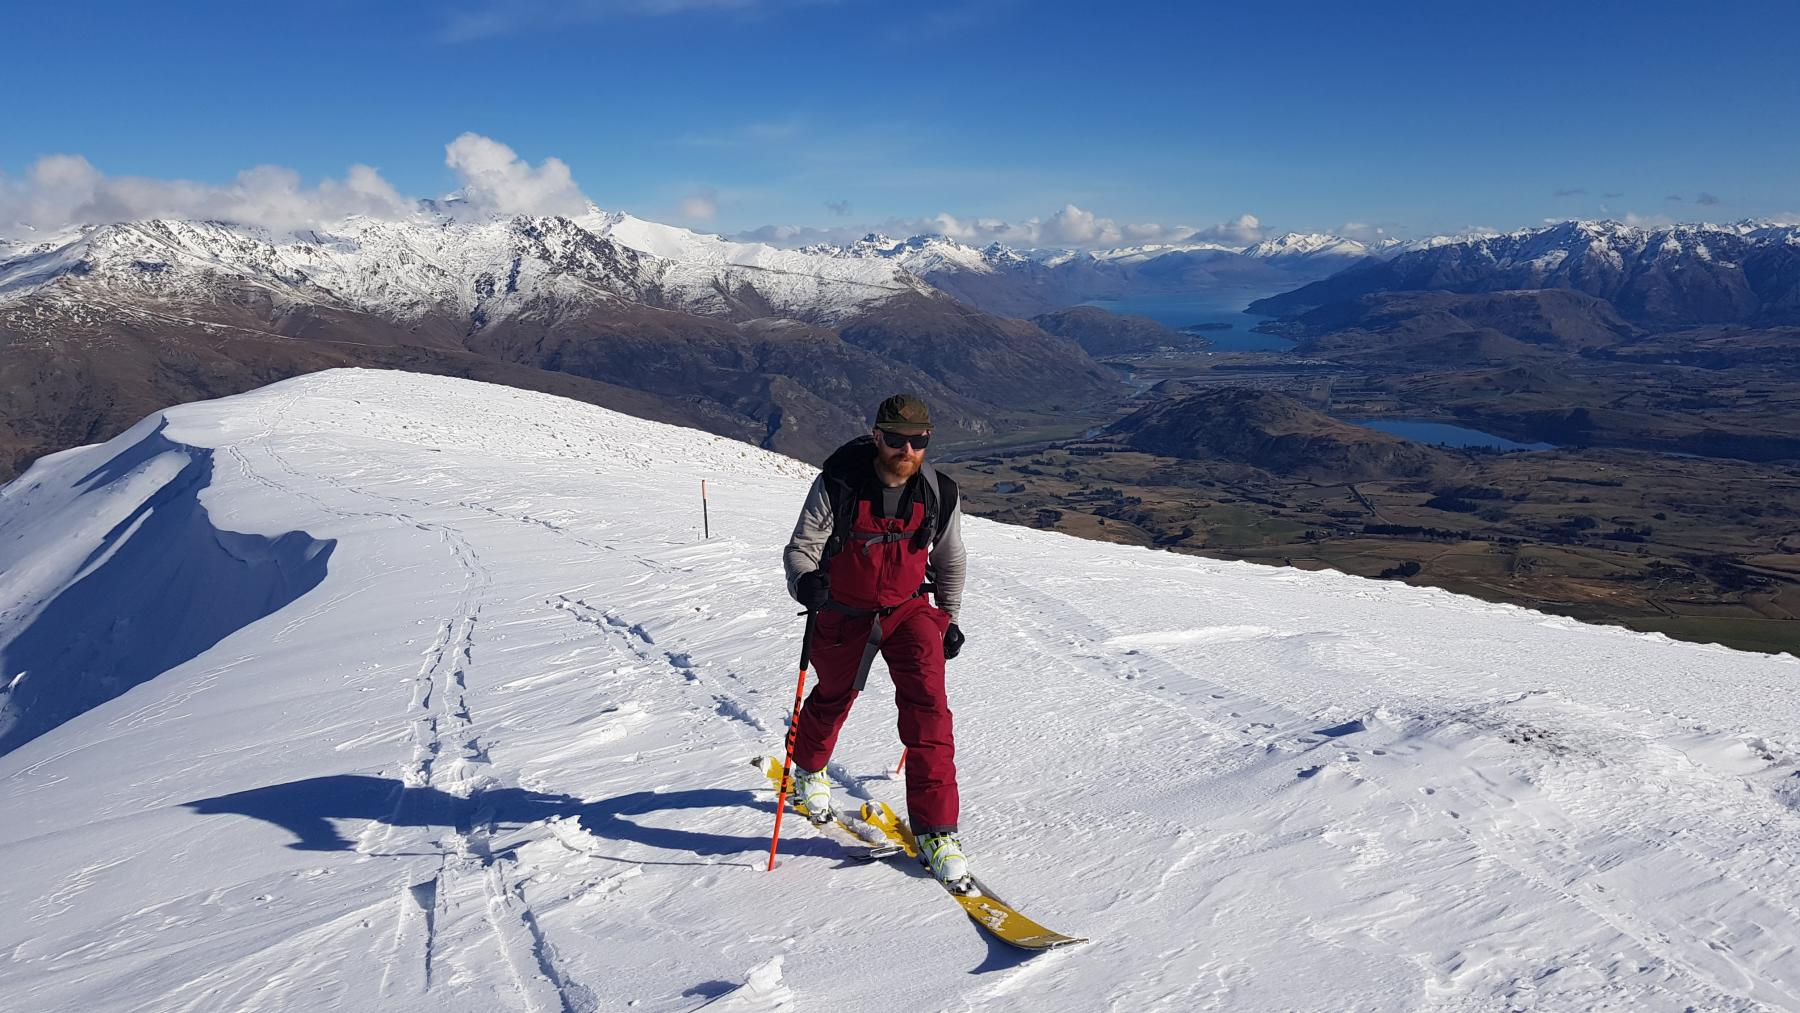 Russ Wilson on Crown Peak, Shot by Alan Swann